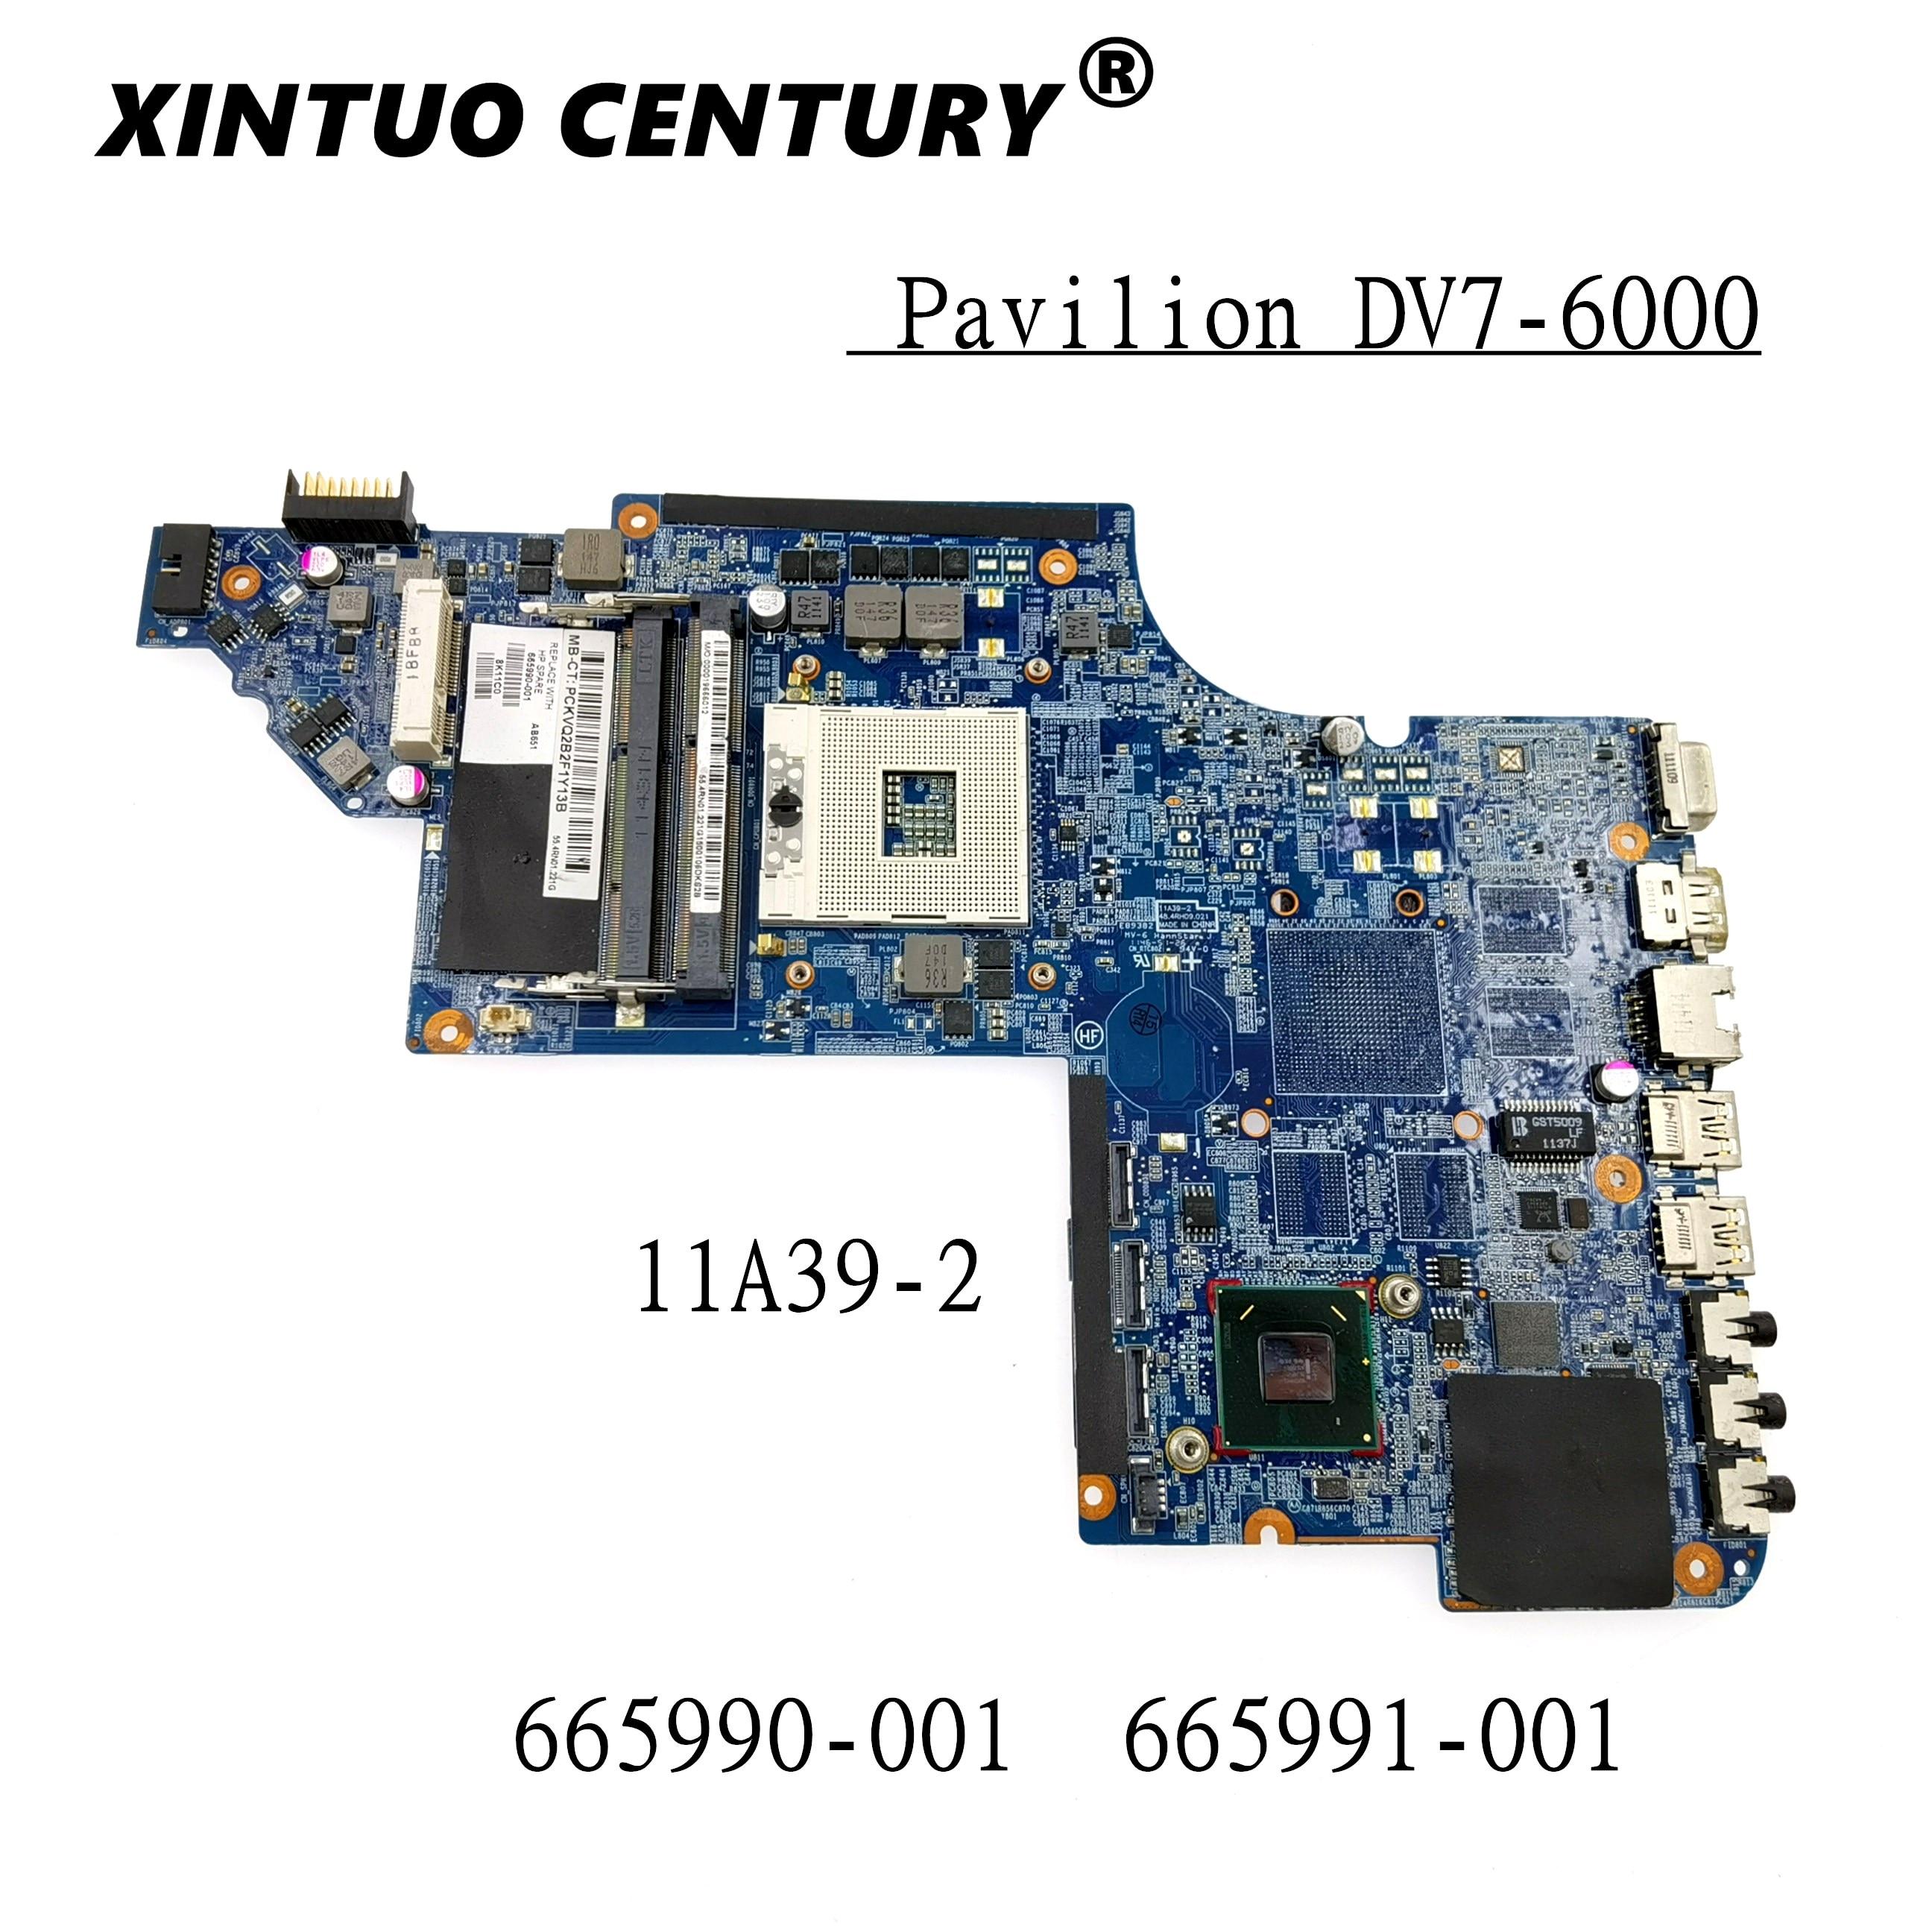 Placa base para ordenador portátil NOKOTION 665991-001 639391-001 para HP Pavilion DV7...